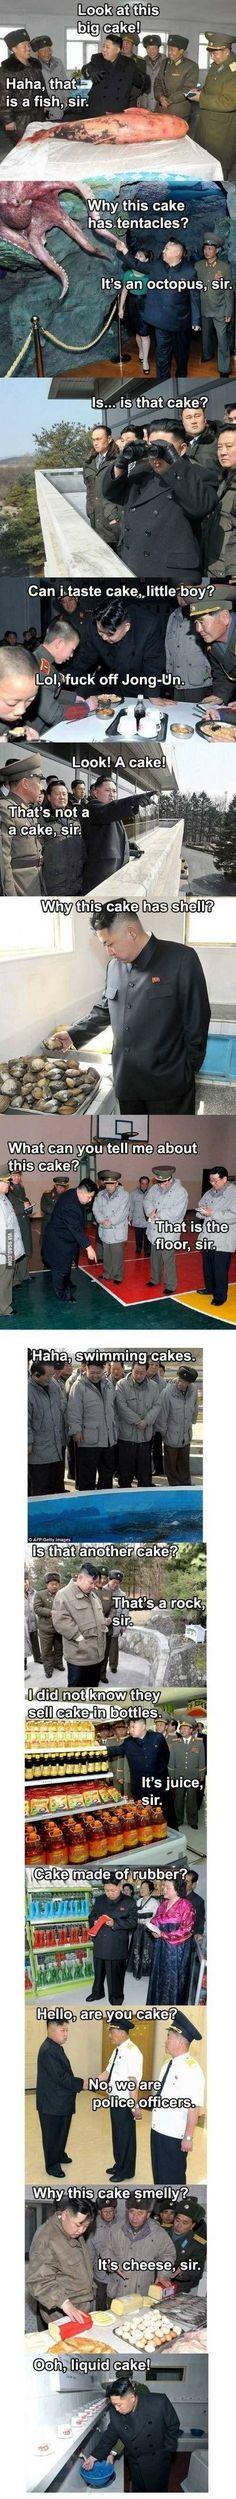 Kim Jong Un discovers the world